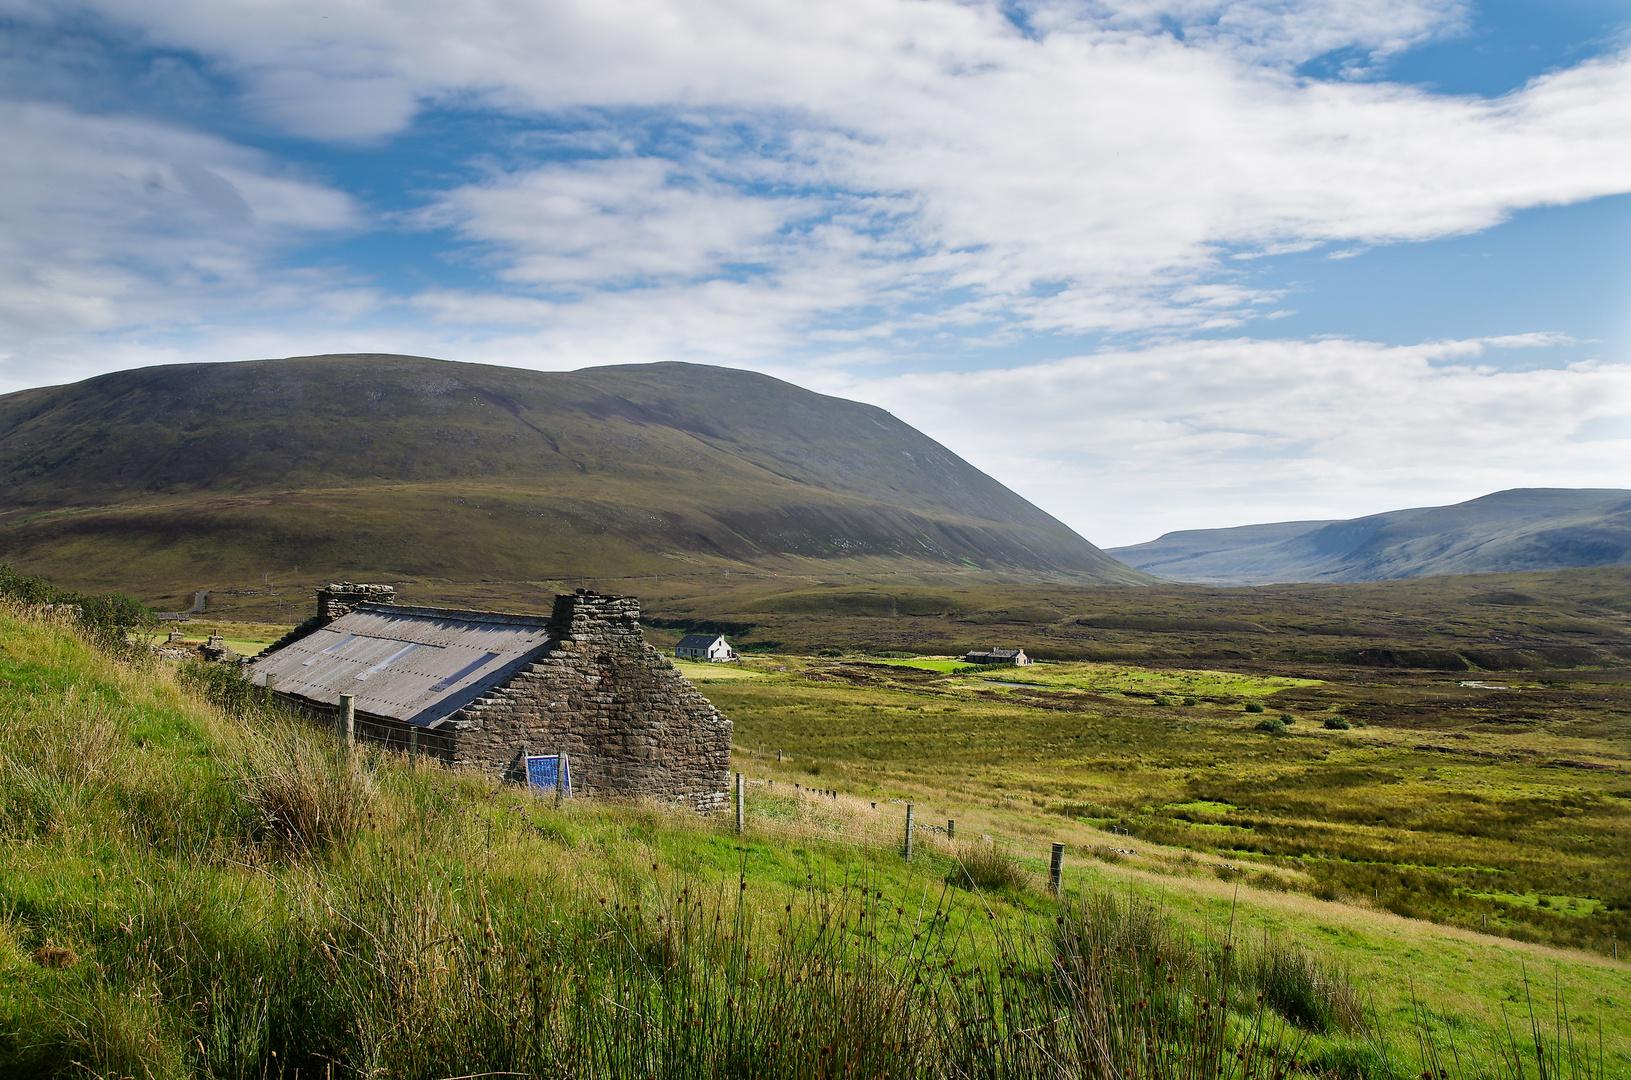 That's scotland- Isle of hoy